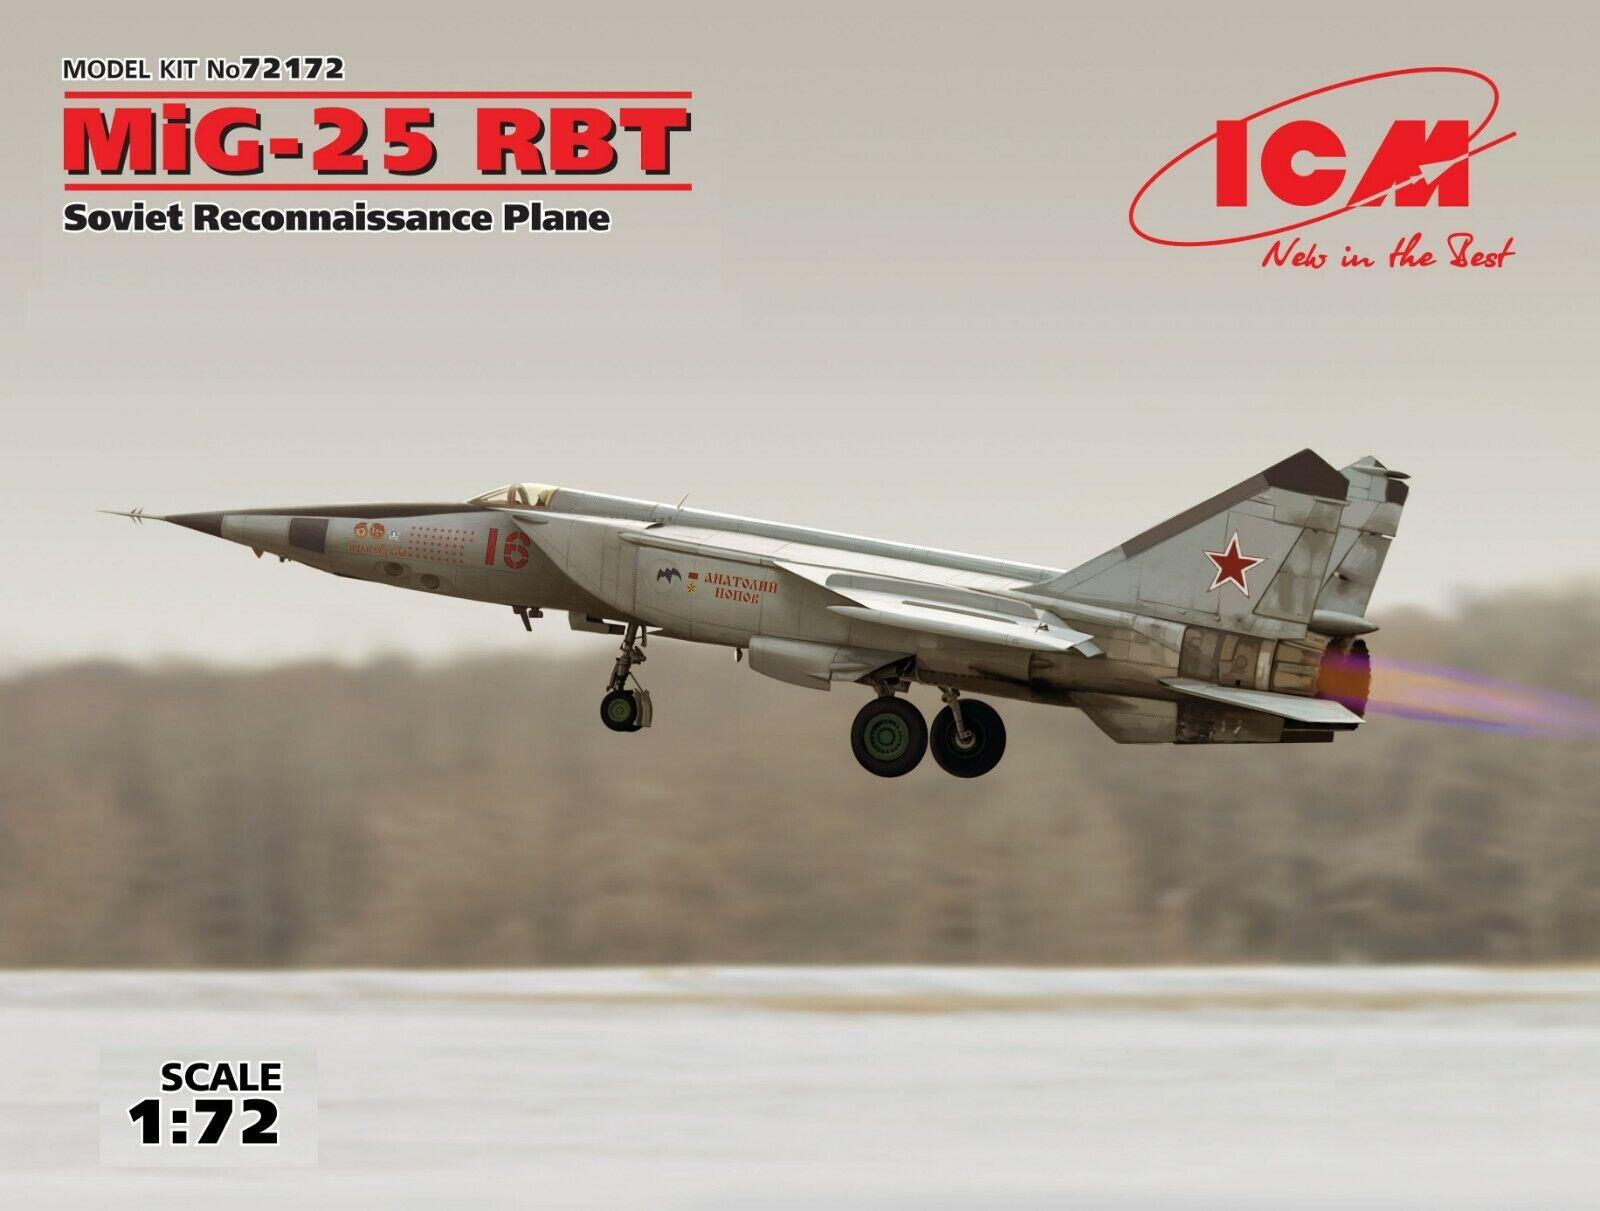 ICM 72172 MiG-25 RBT, Soviet Reconnaissance Plane 1 72 plastic model kit 298 mm